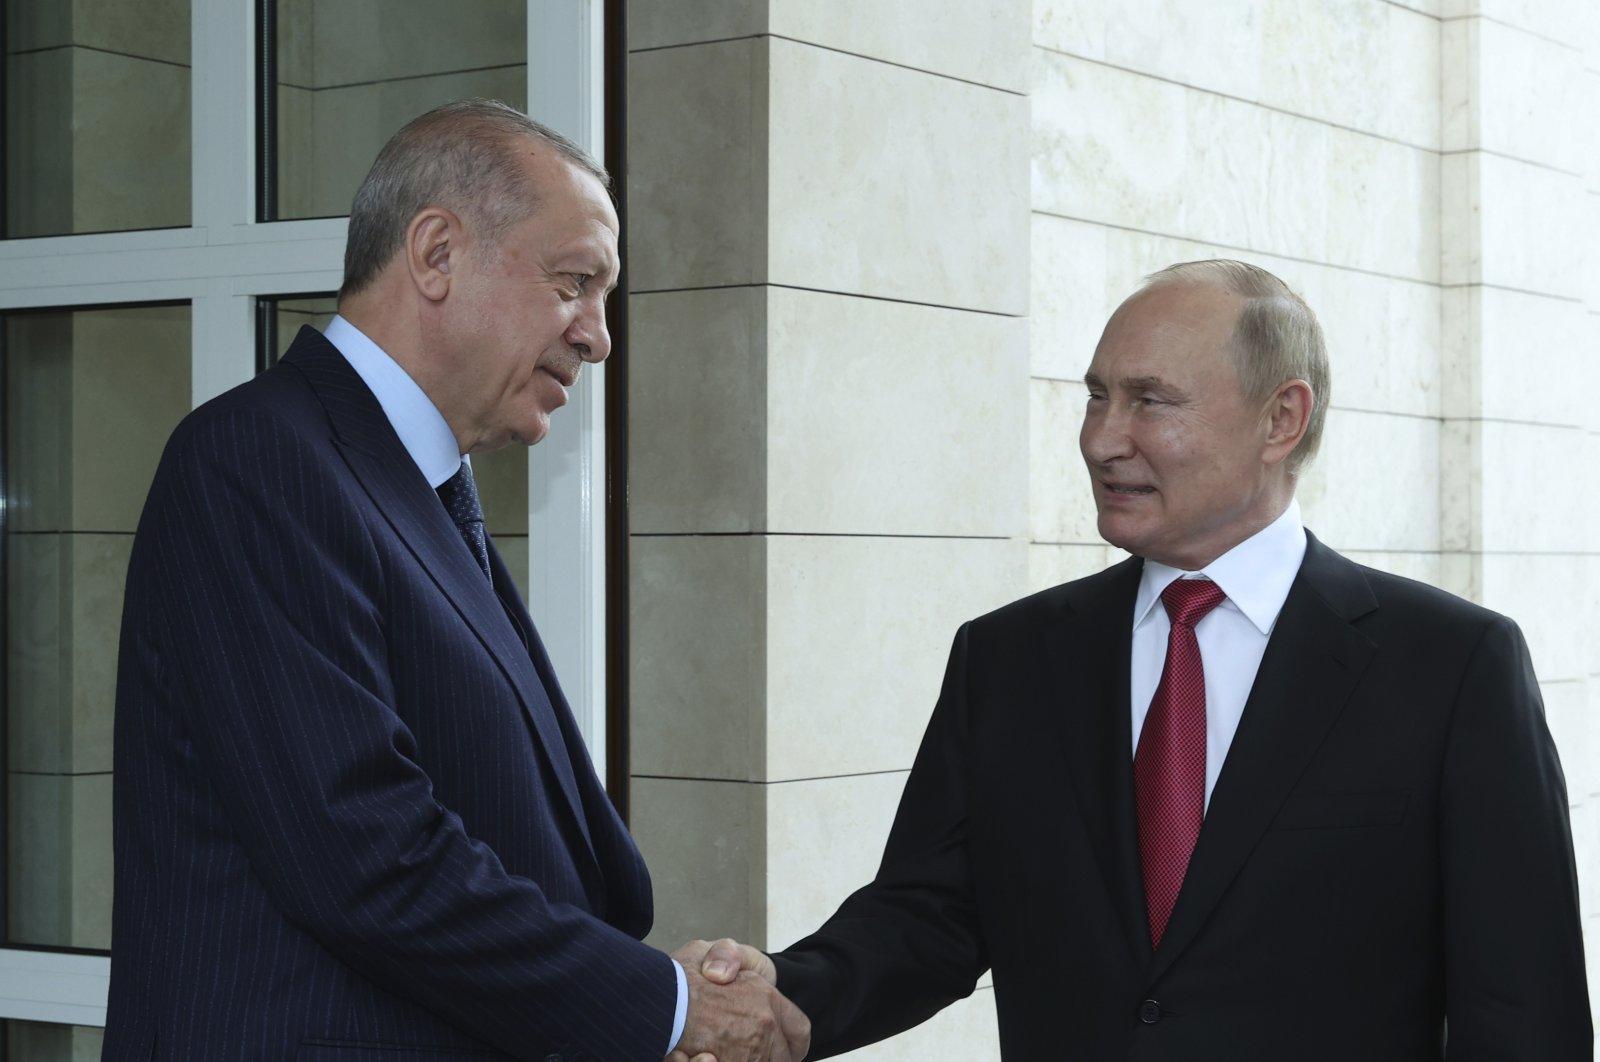 Russian President Vladimir Putin (R) and Turkish President Recep Tayyip Erdoğan speak as Erdoğan leaves after their talks at the Bocharov Ruchei residence in the Black Sea resort of Sochi, Russia, Sept. 29, 2021. (AP Photo)